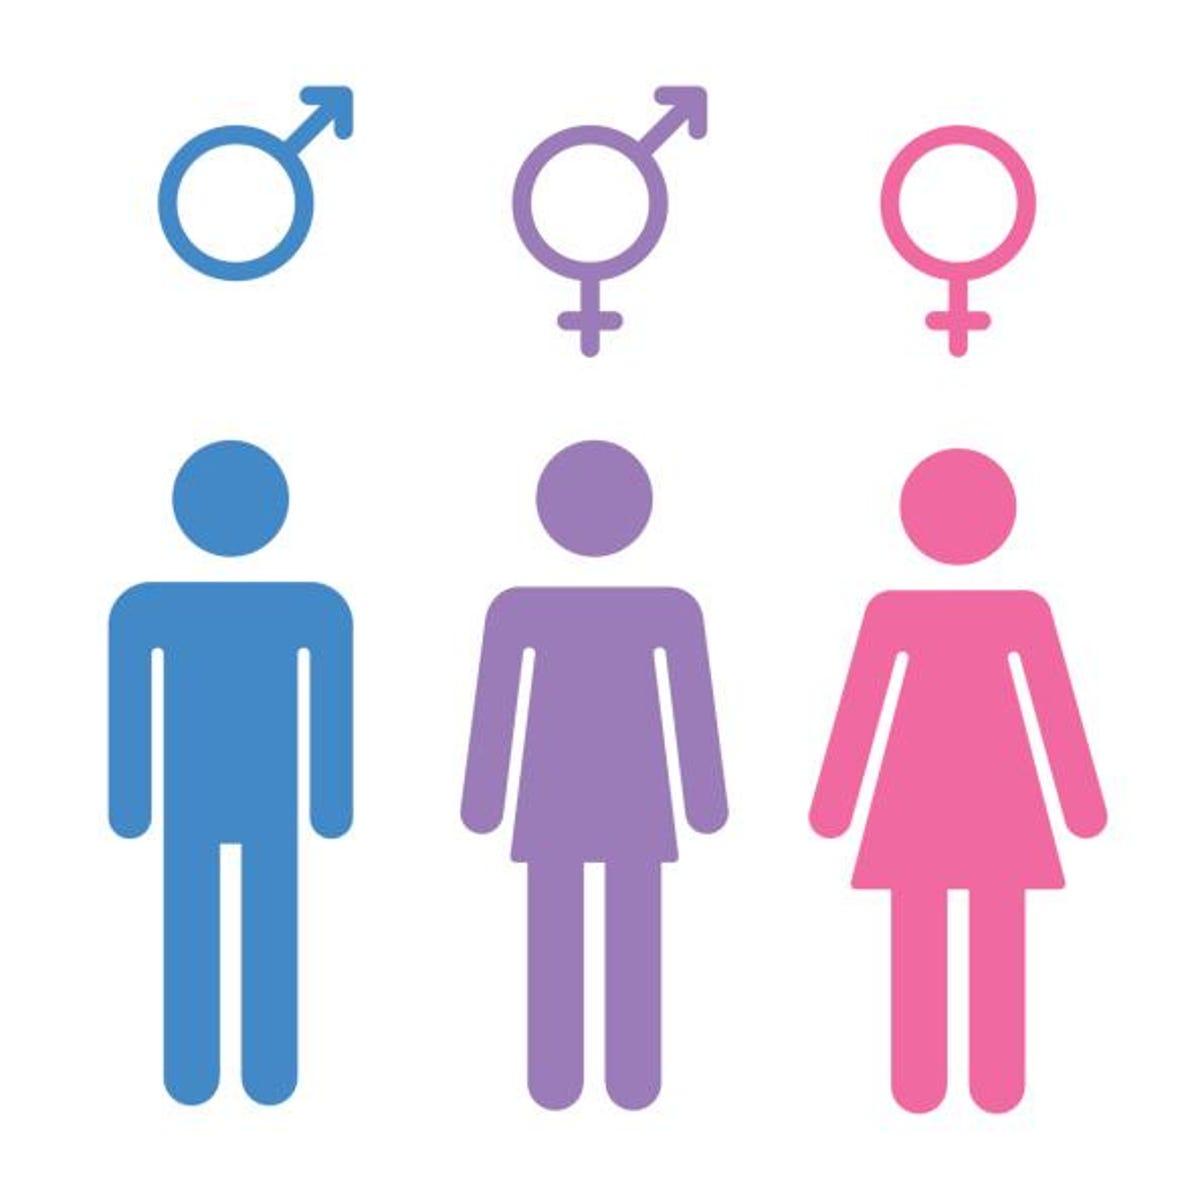 Terrific Marcus Two Sides To Transgender Bathroom Debate Download Free Architecture Designs Scobabritishbridgeorg